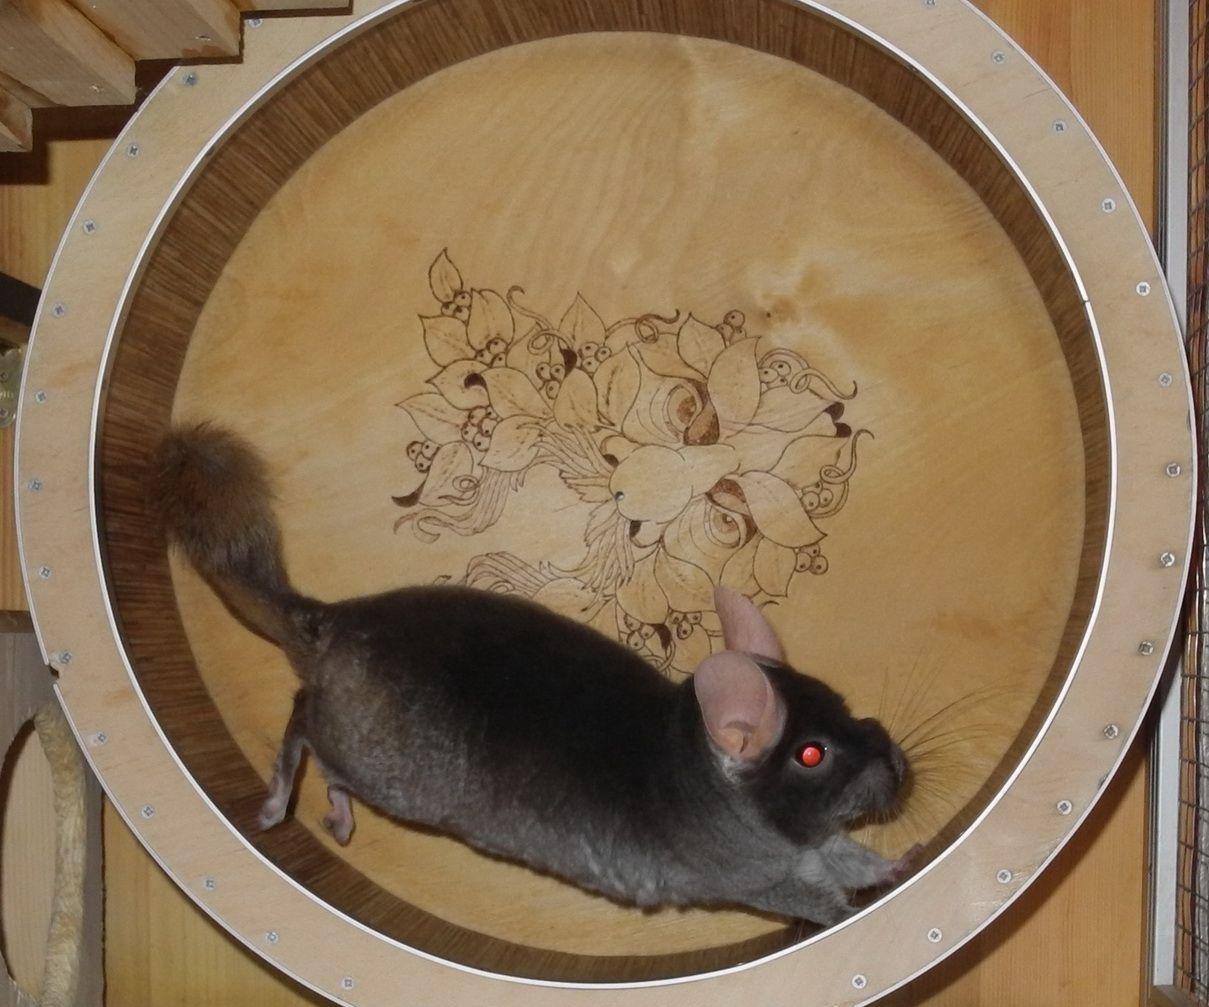 Chinchilla exercise wheel